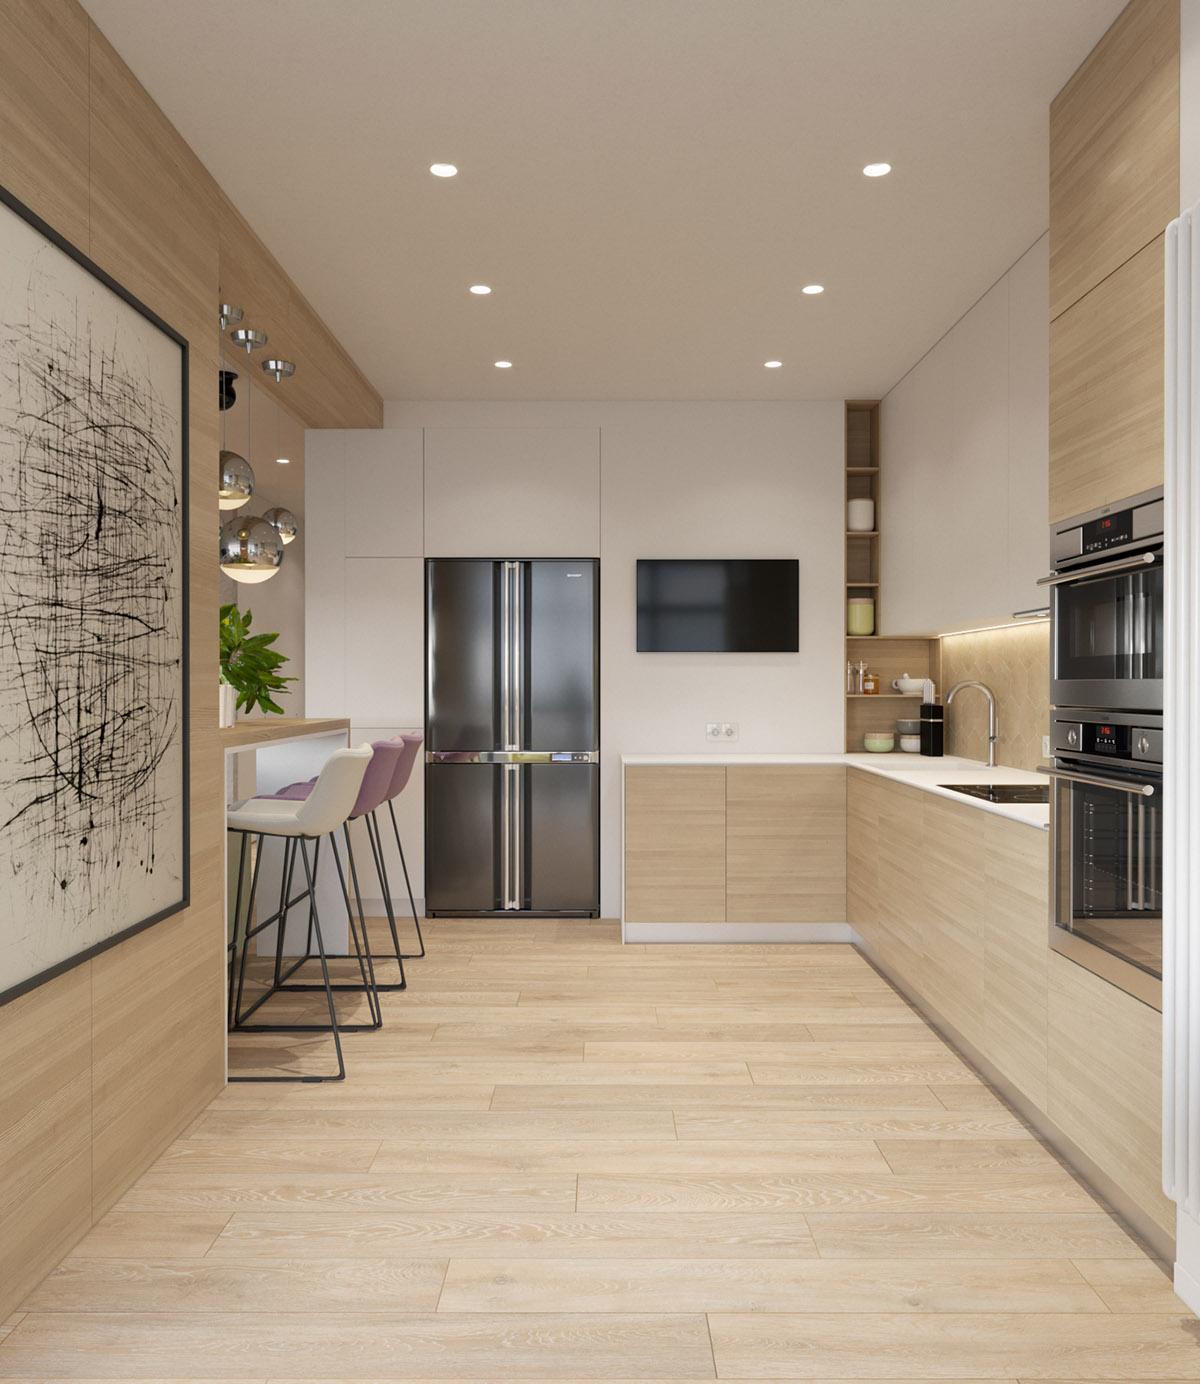 wood-and-white-kitchen-design